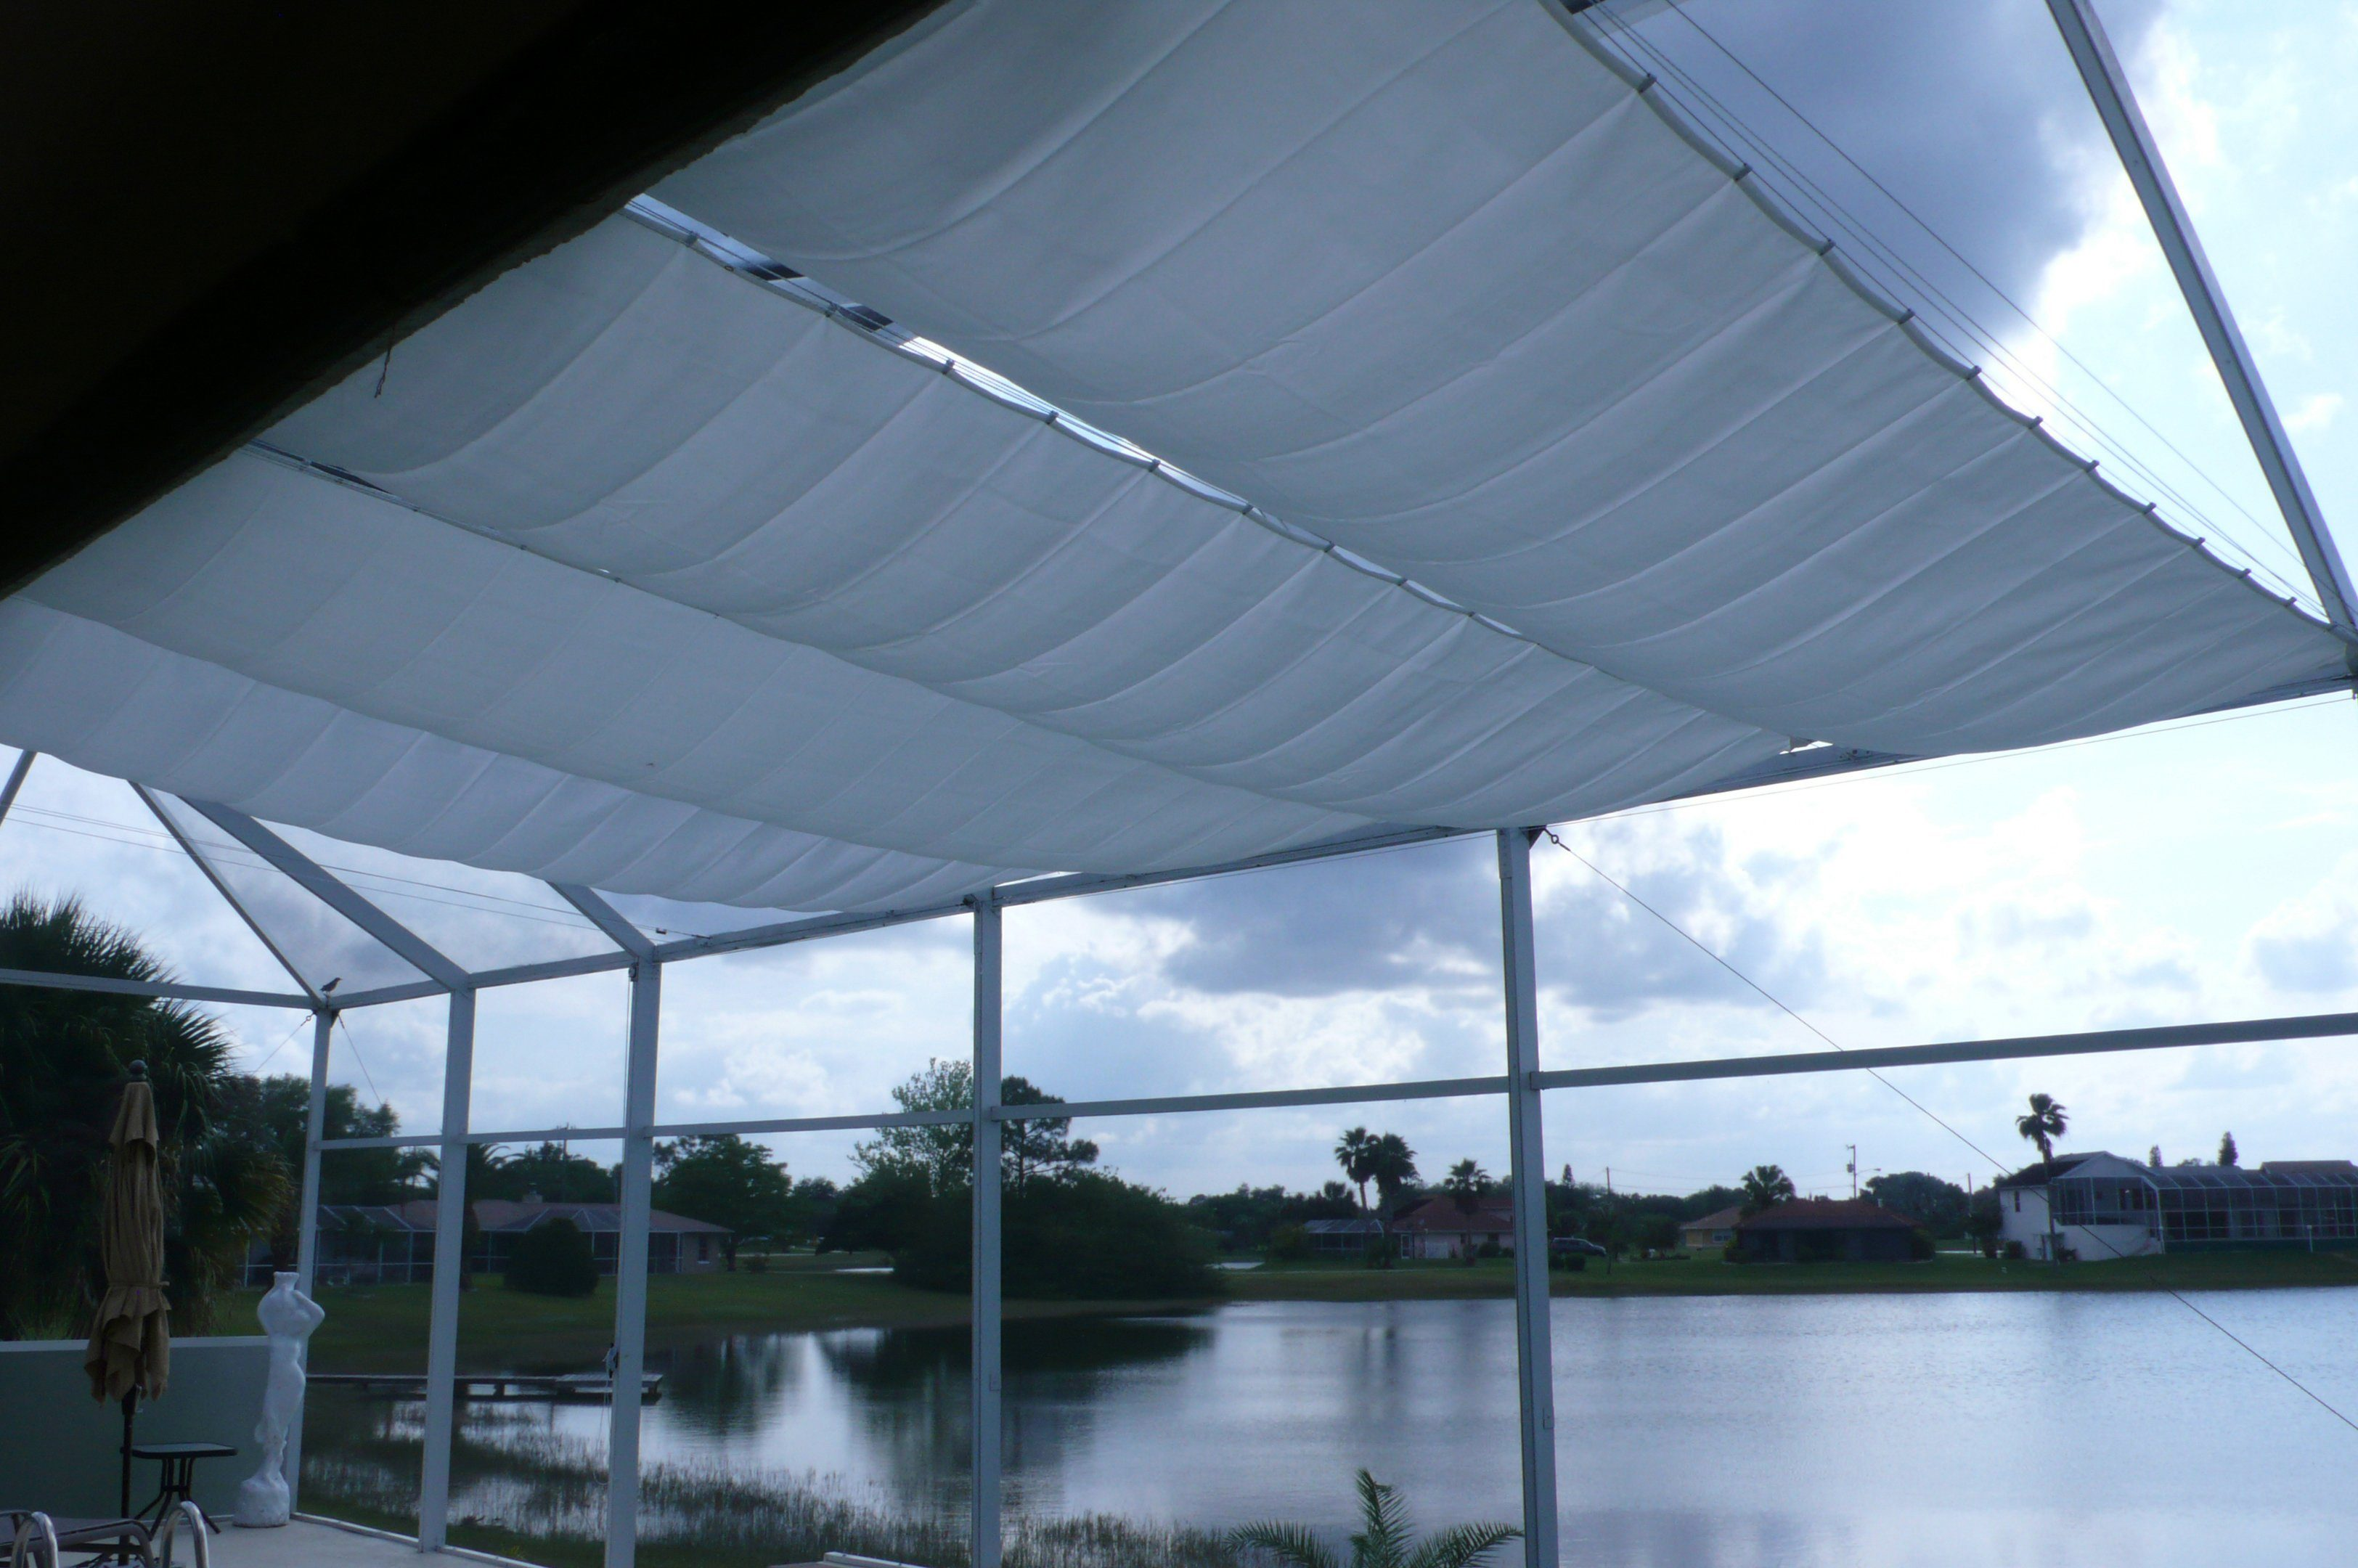 FLORACORD Sonnensegel »Bausatz Universal«, BxL: 330x140 cm, silbergrau